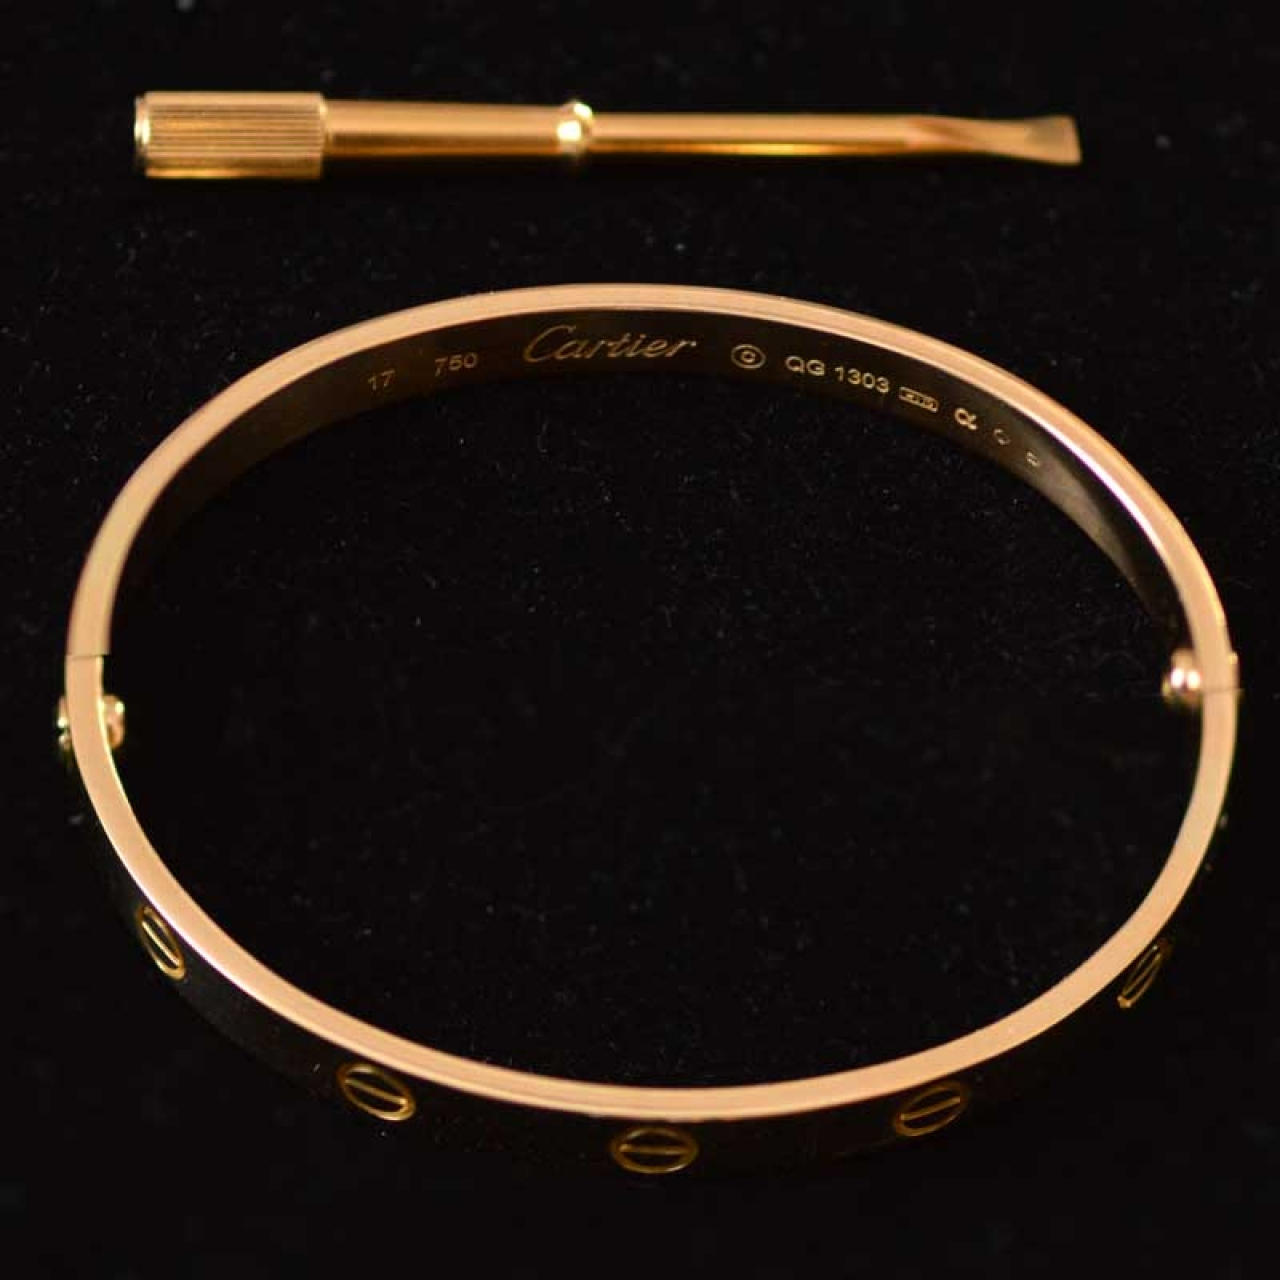 cartier-love-bracelet-vintage-18k-yellow-gold